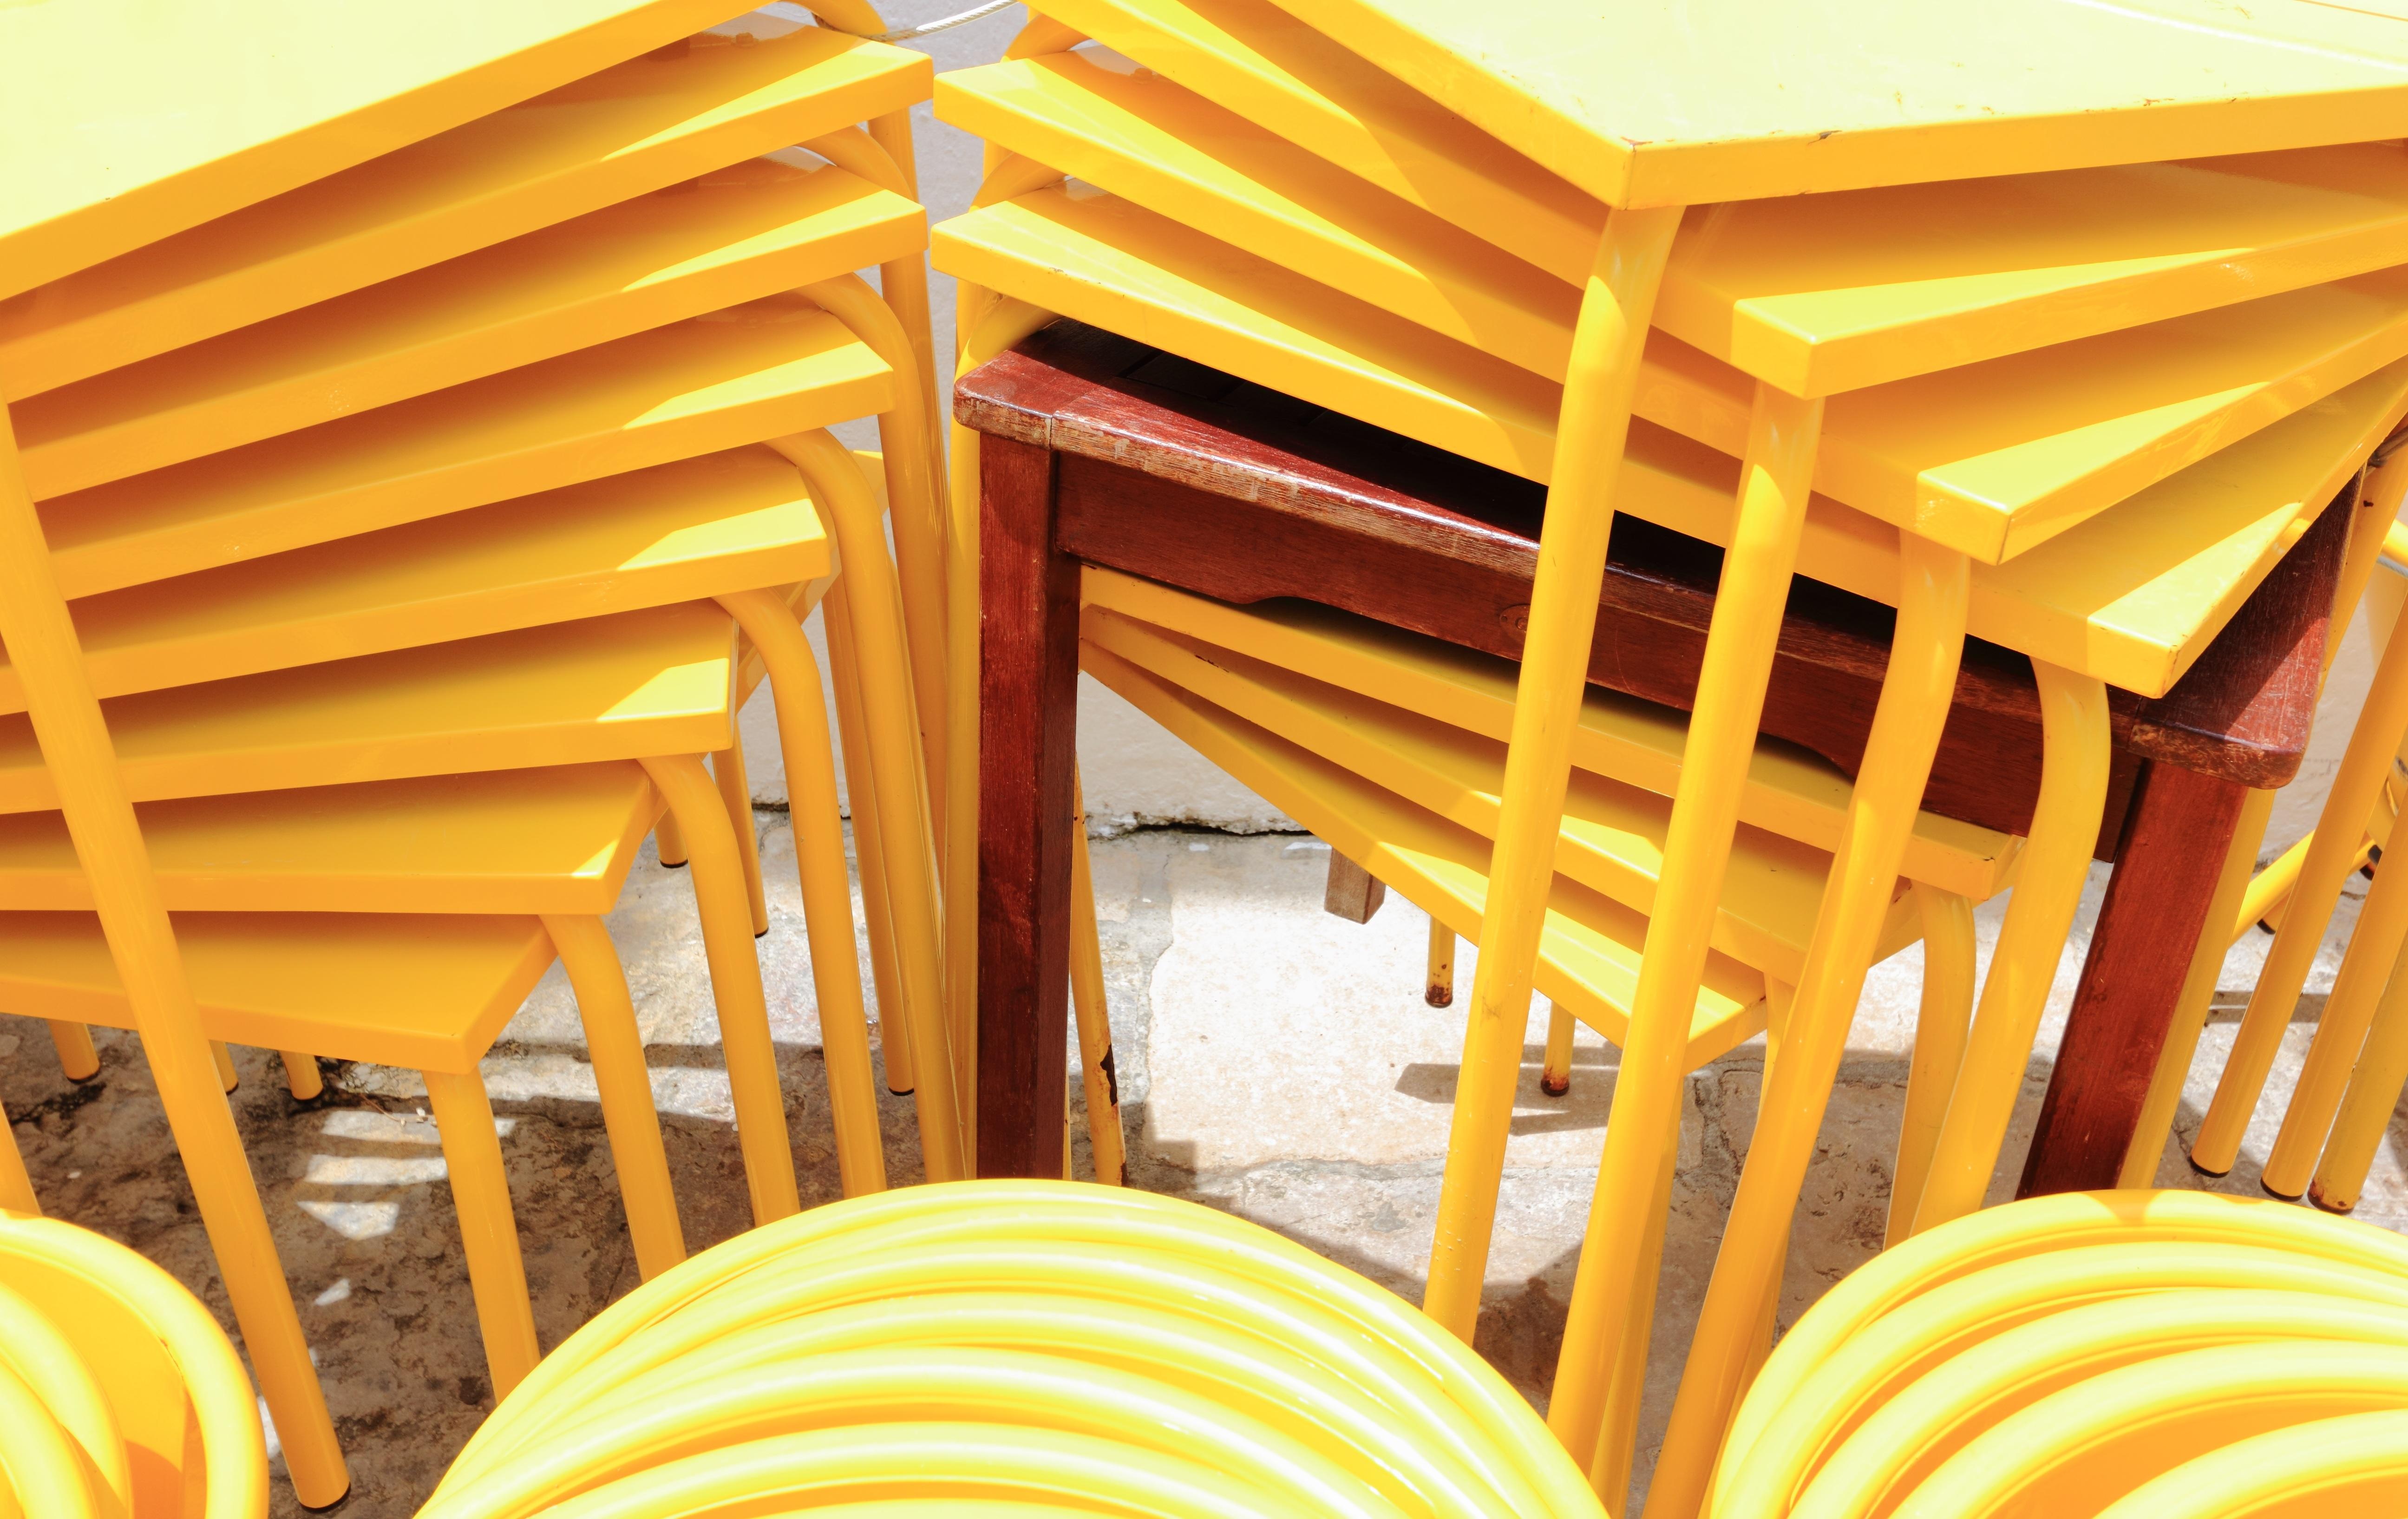 Kostenlose foto : Holz, Restaurant, Zimmer, Treppe, Gestapelt ...